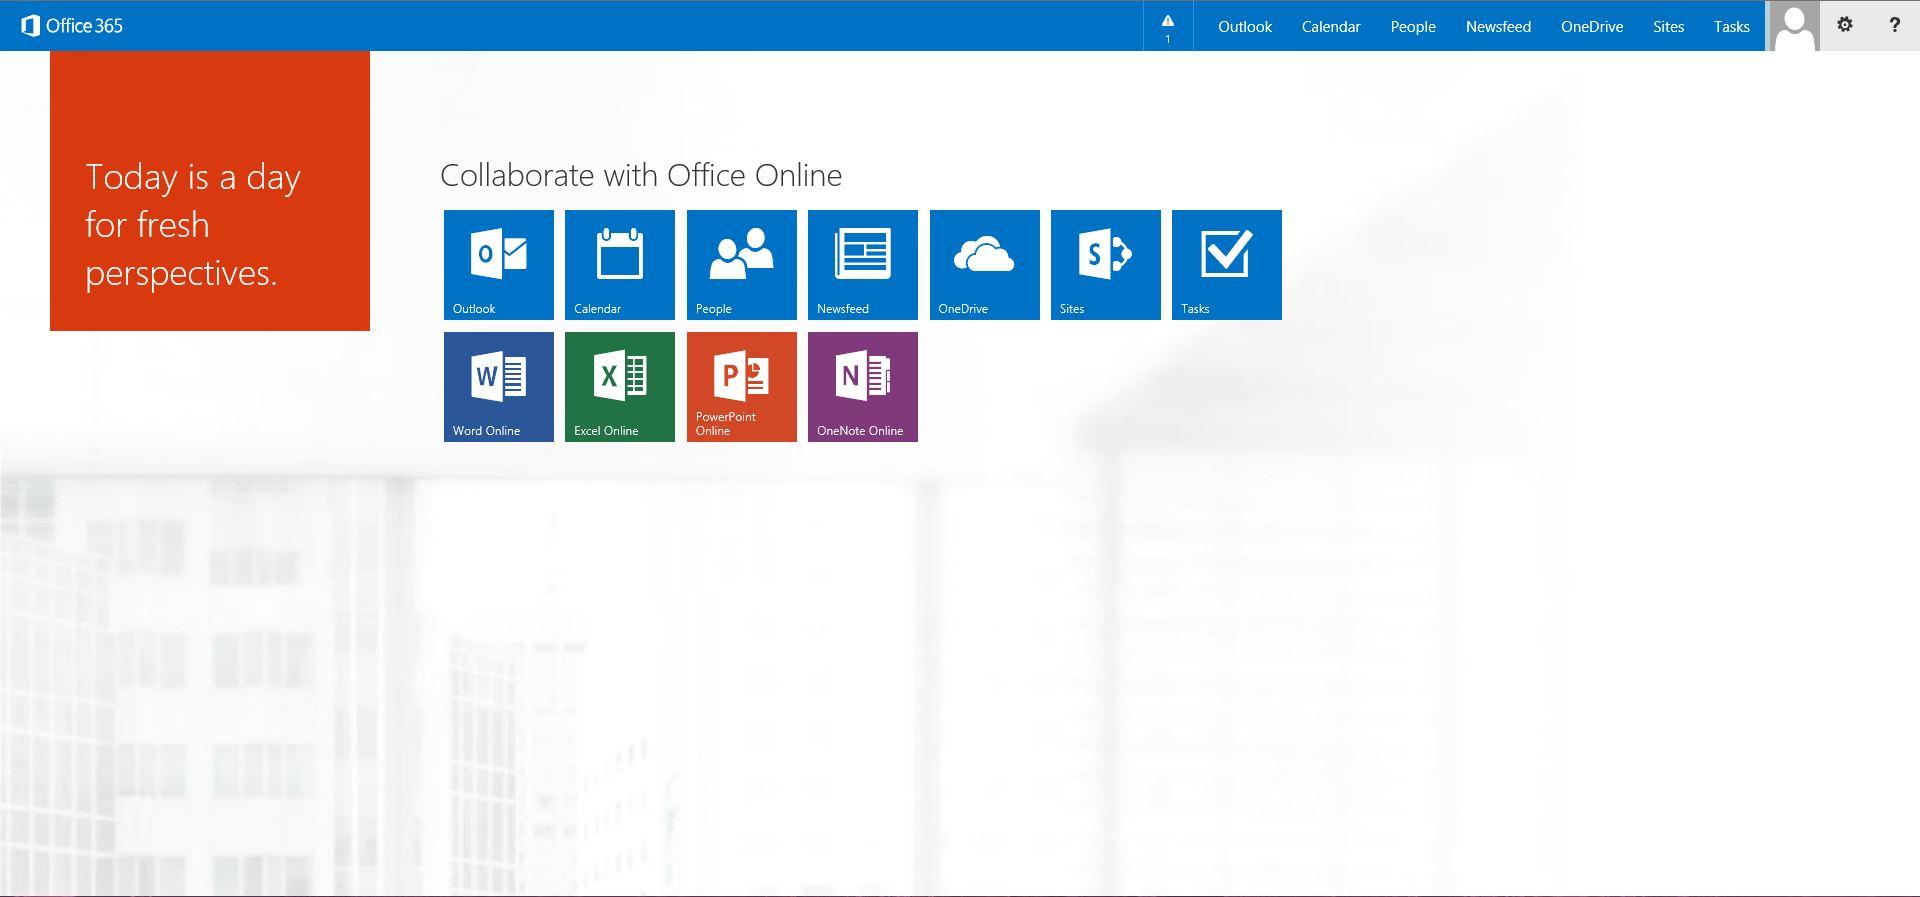 Change Office 365 Start Page | Miss Tech